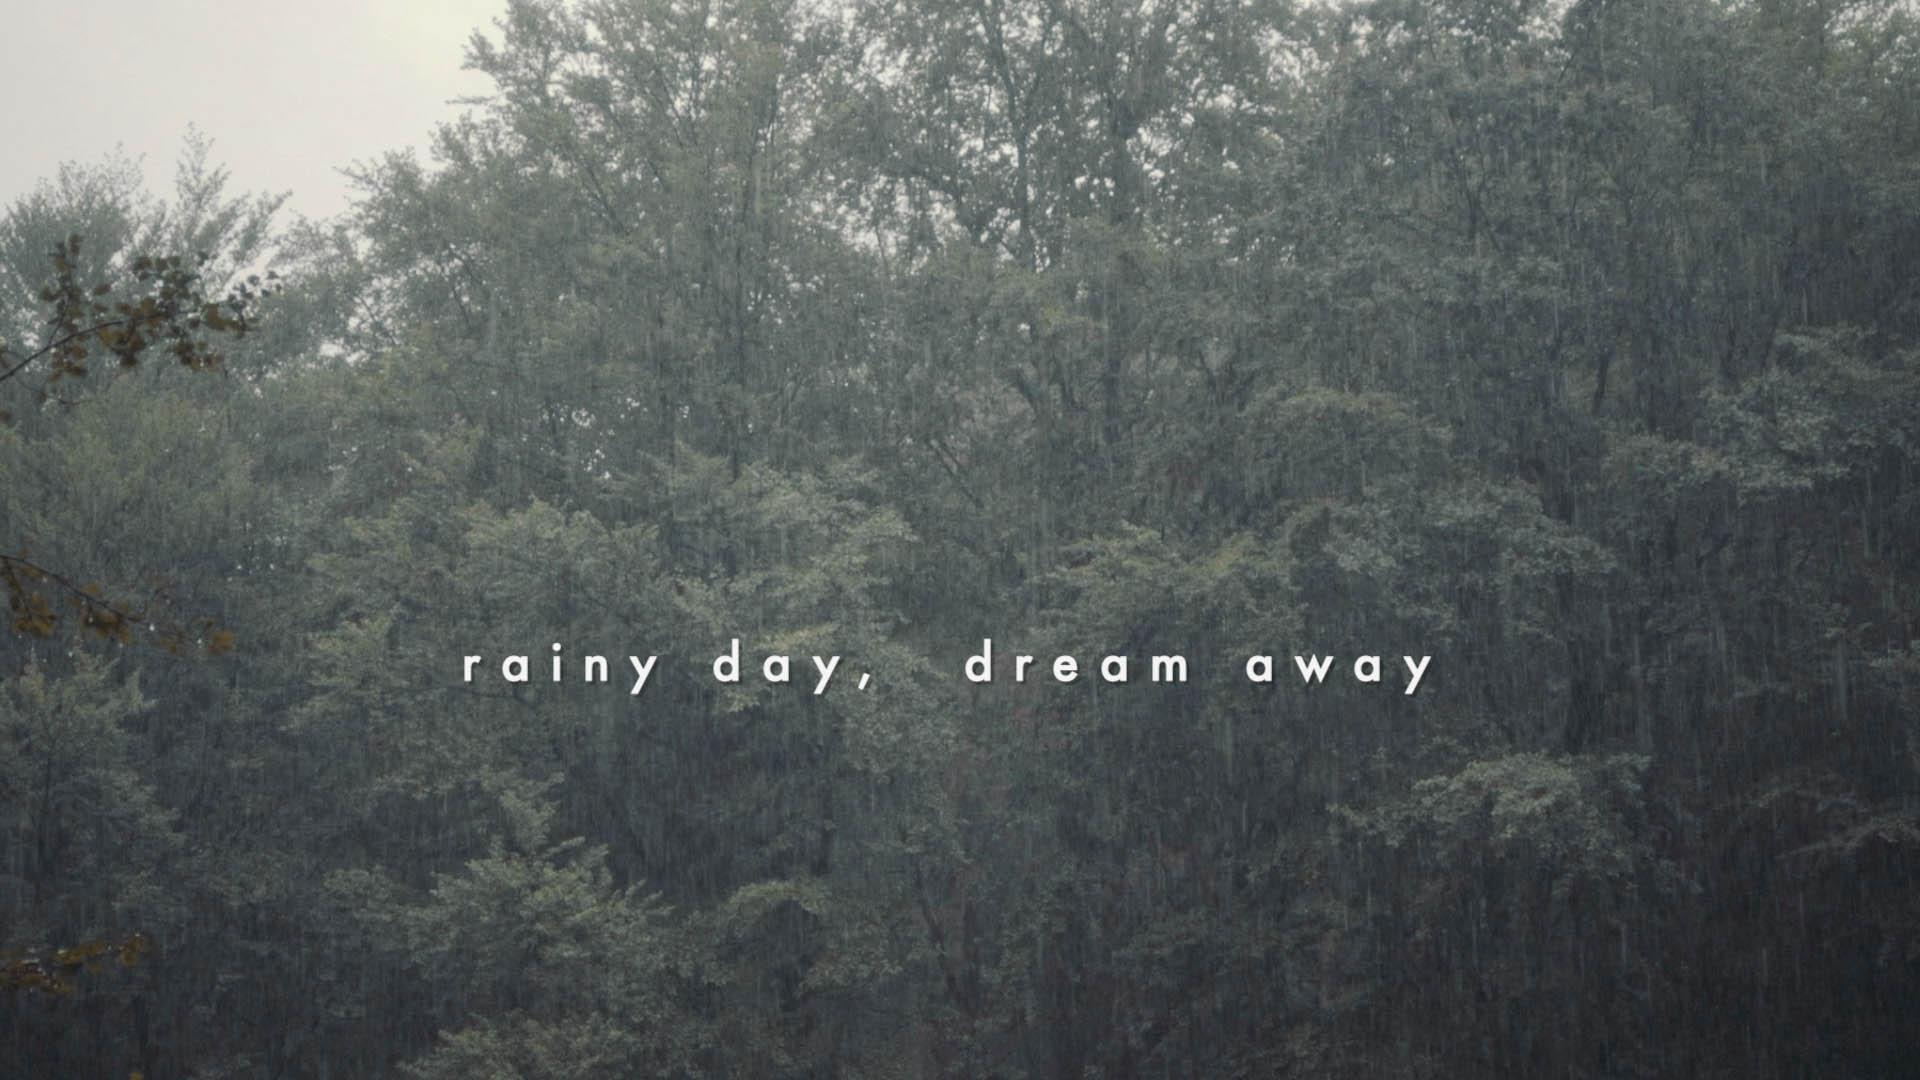 rainy day, dream away